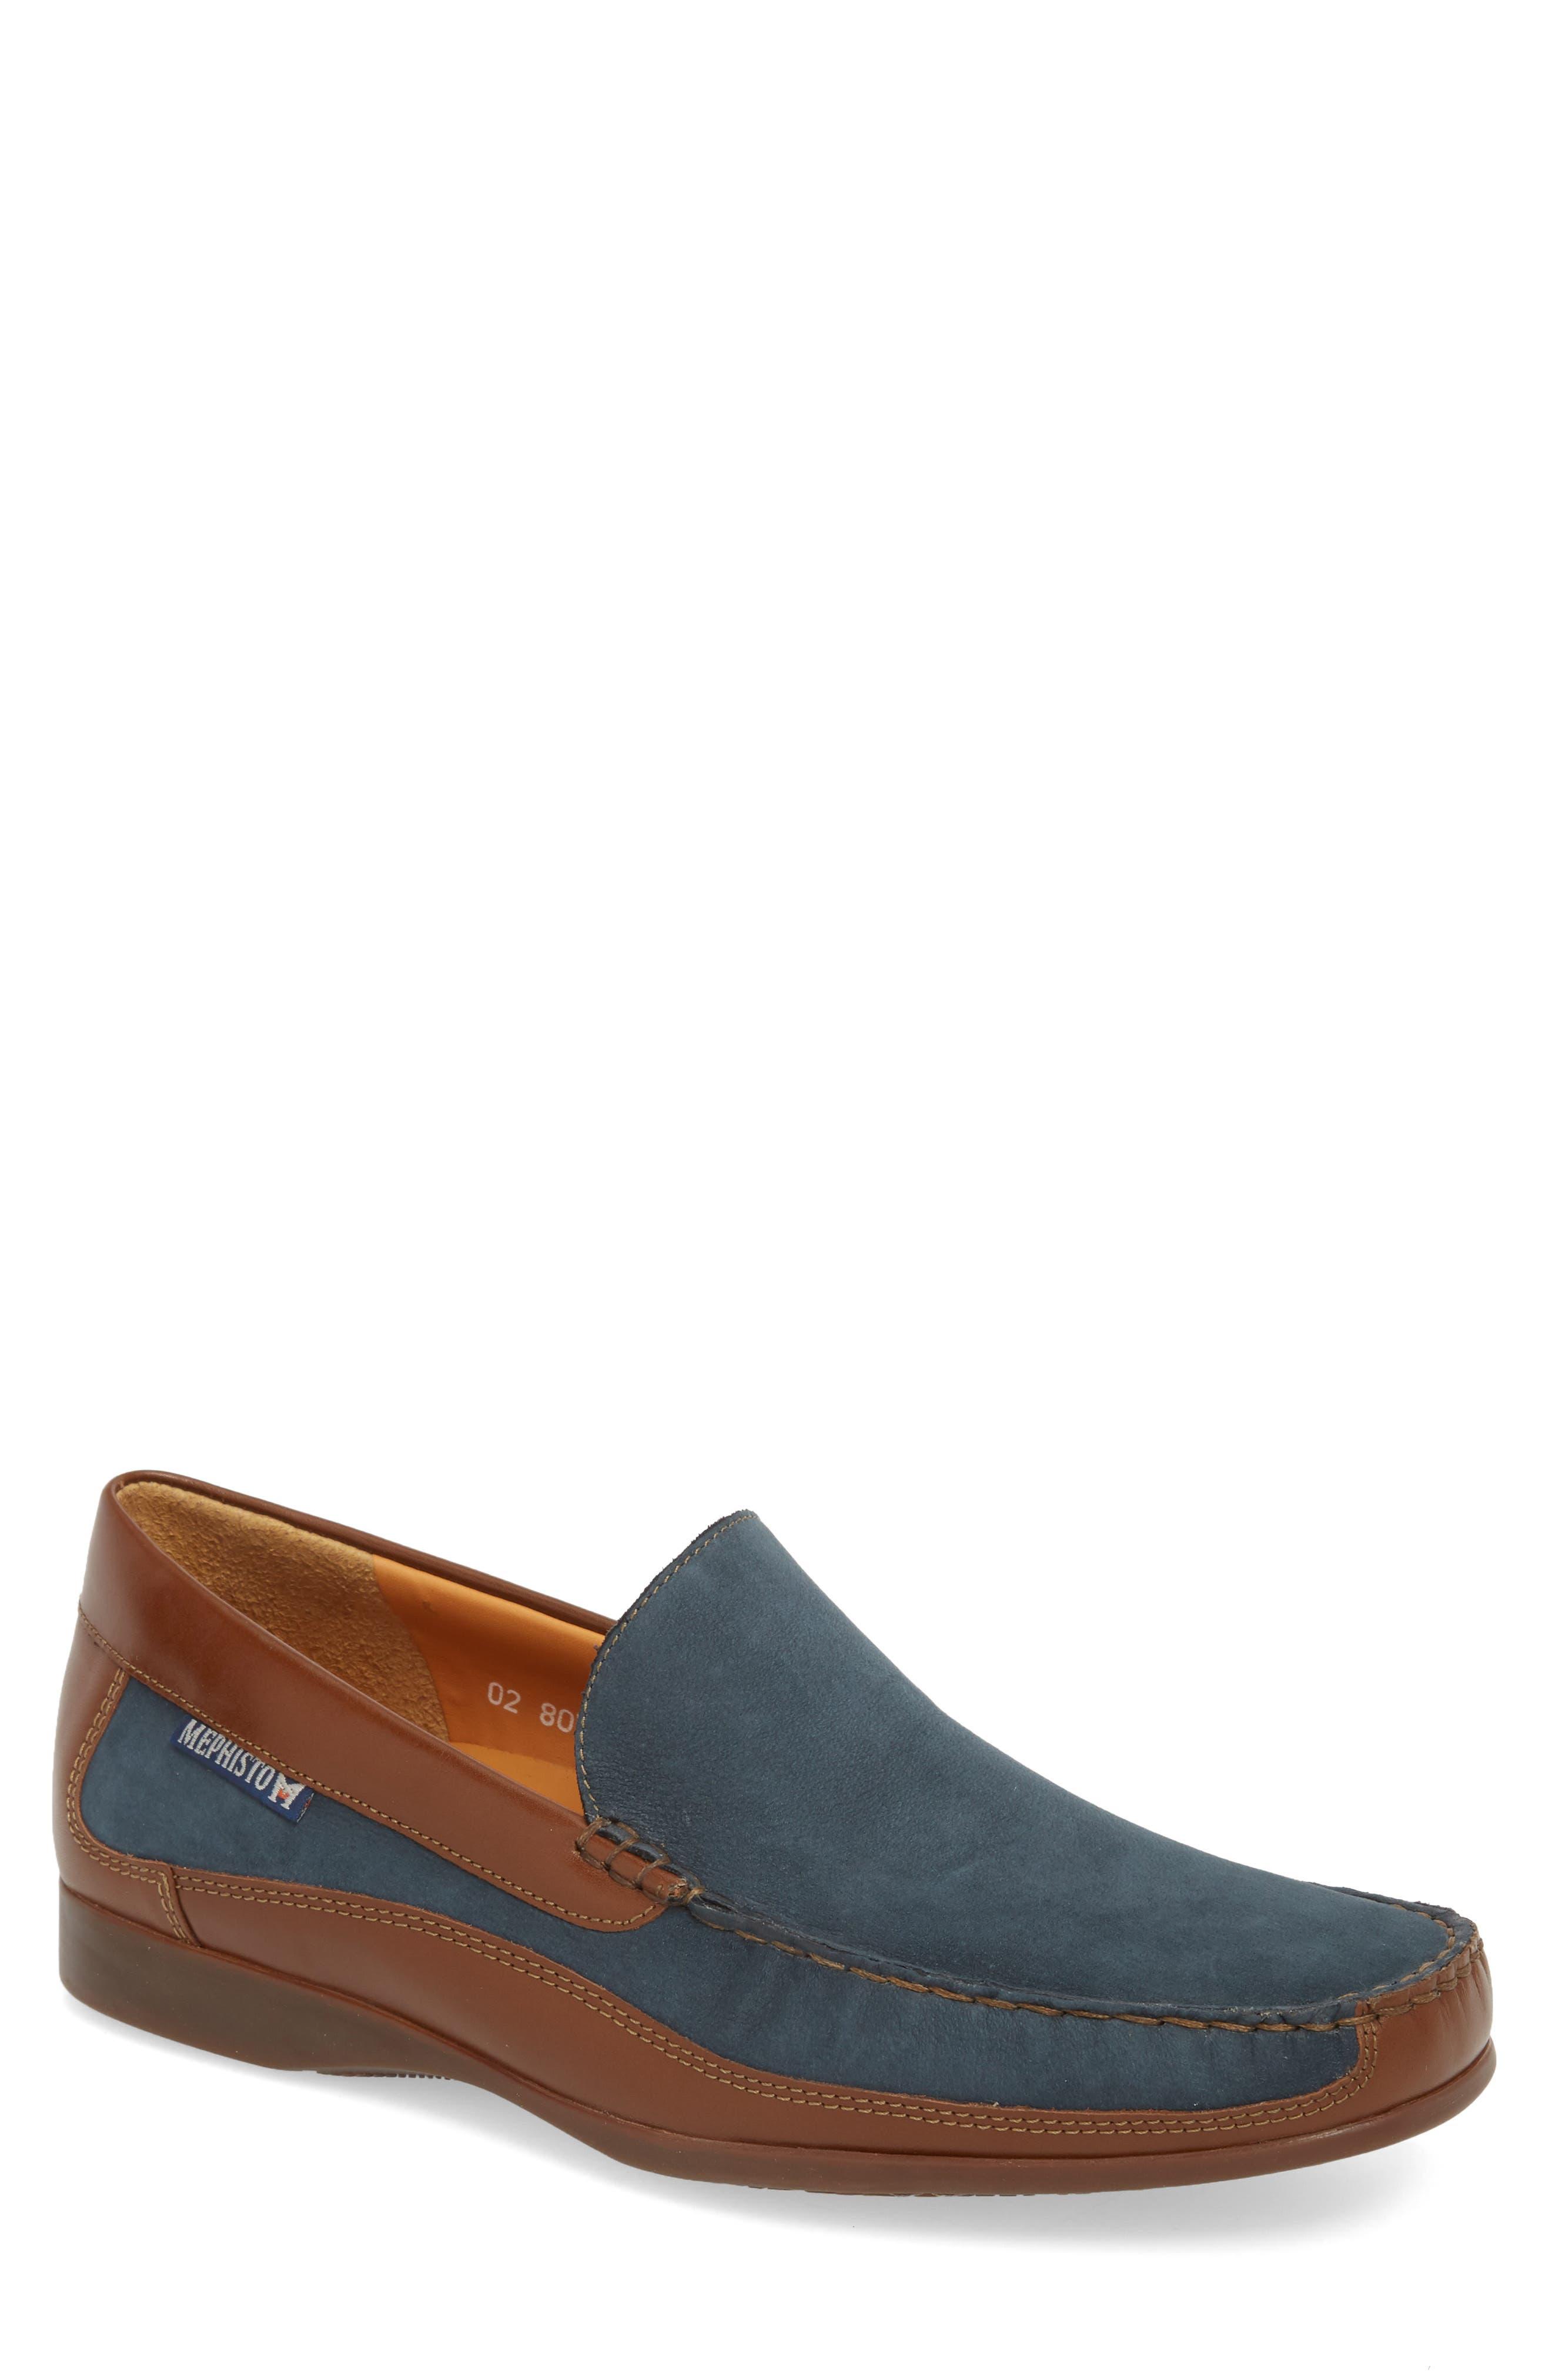 'Baduard' Loafer,                         Main,                         color, NAVY/ HAZELNUT